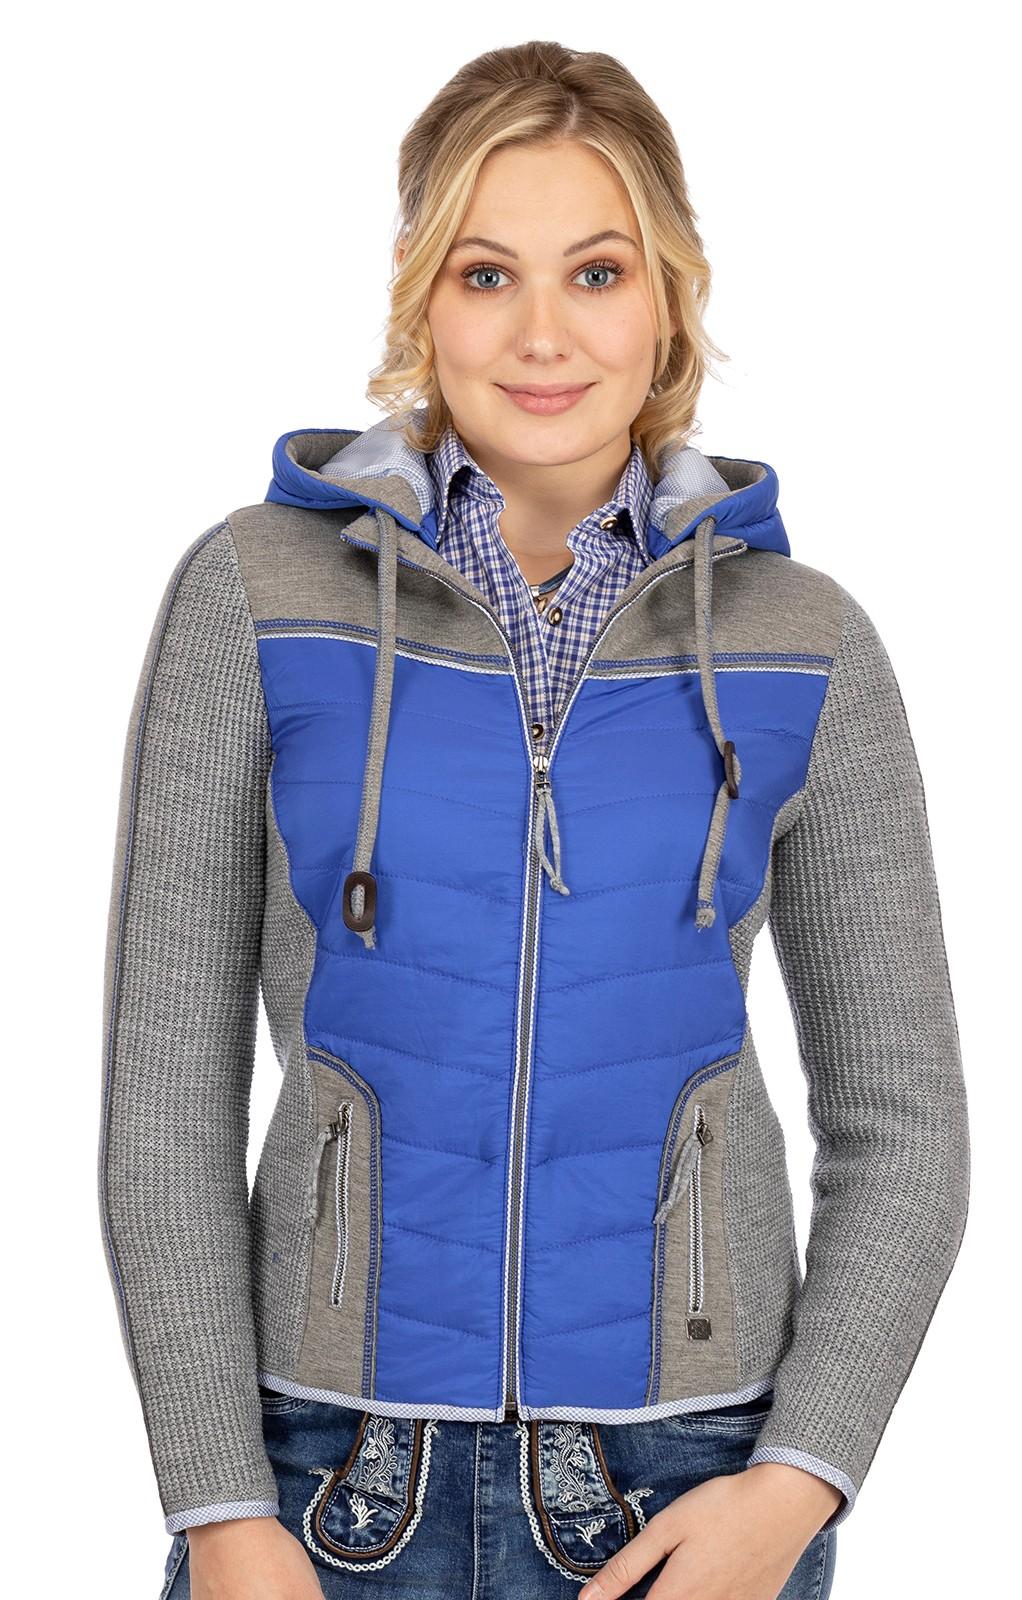 Spieth & Wensky Costumes Outdoor Jacket NALBACH blue light gray